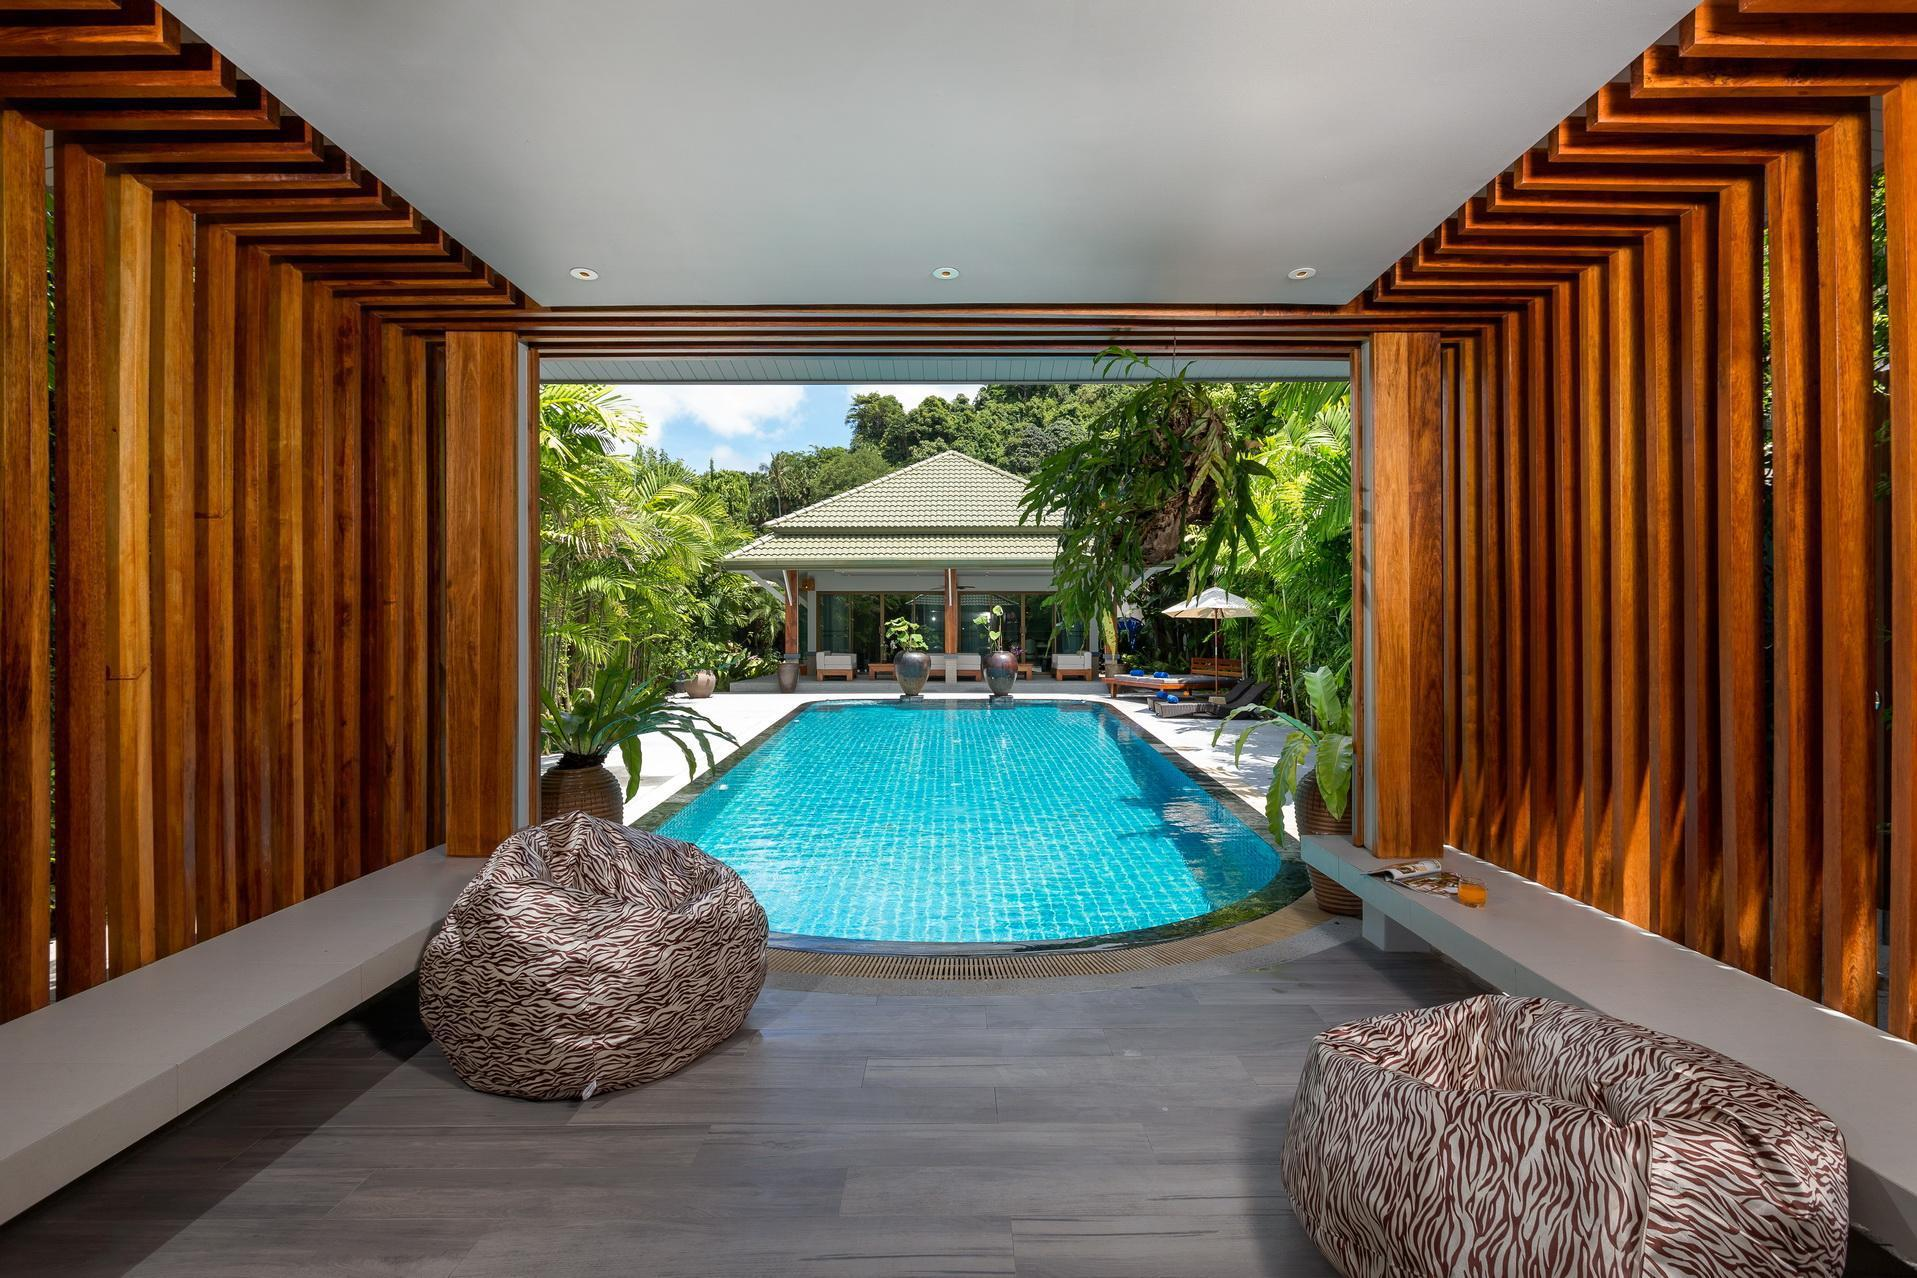 Villa Dok Keaw วิลลา 4 ห้องนอน 5 ห้องน้ำส่วนตัว ขนาด 368 ตร.ม. – กะรน